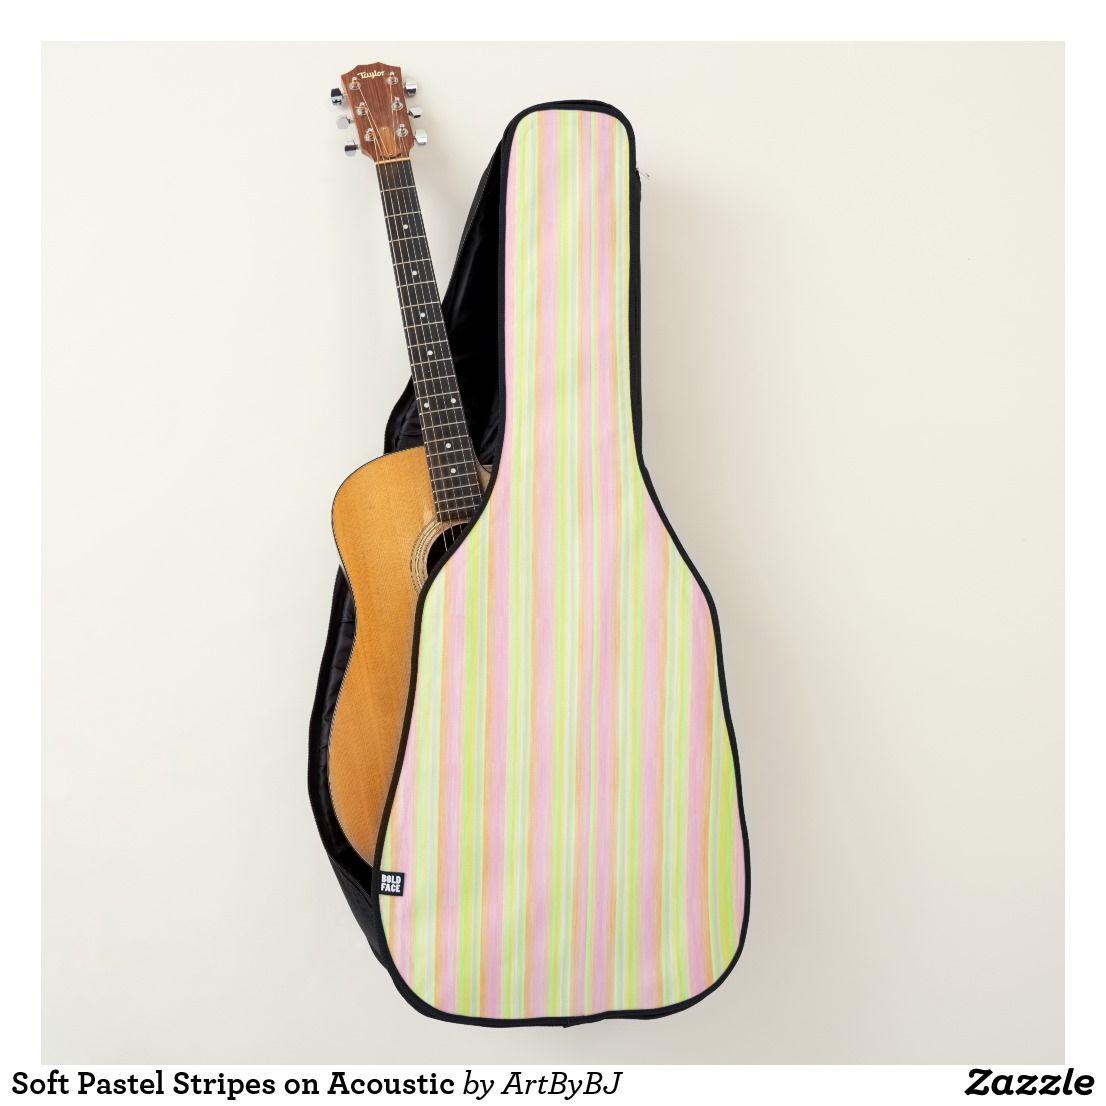 Soft Pastel Stripes On Acoustic Guitar Case Zazzle Com Guitar Case Acoustic Guitar Case Guitar